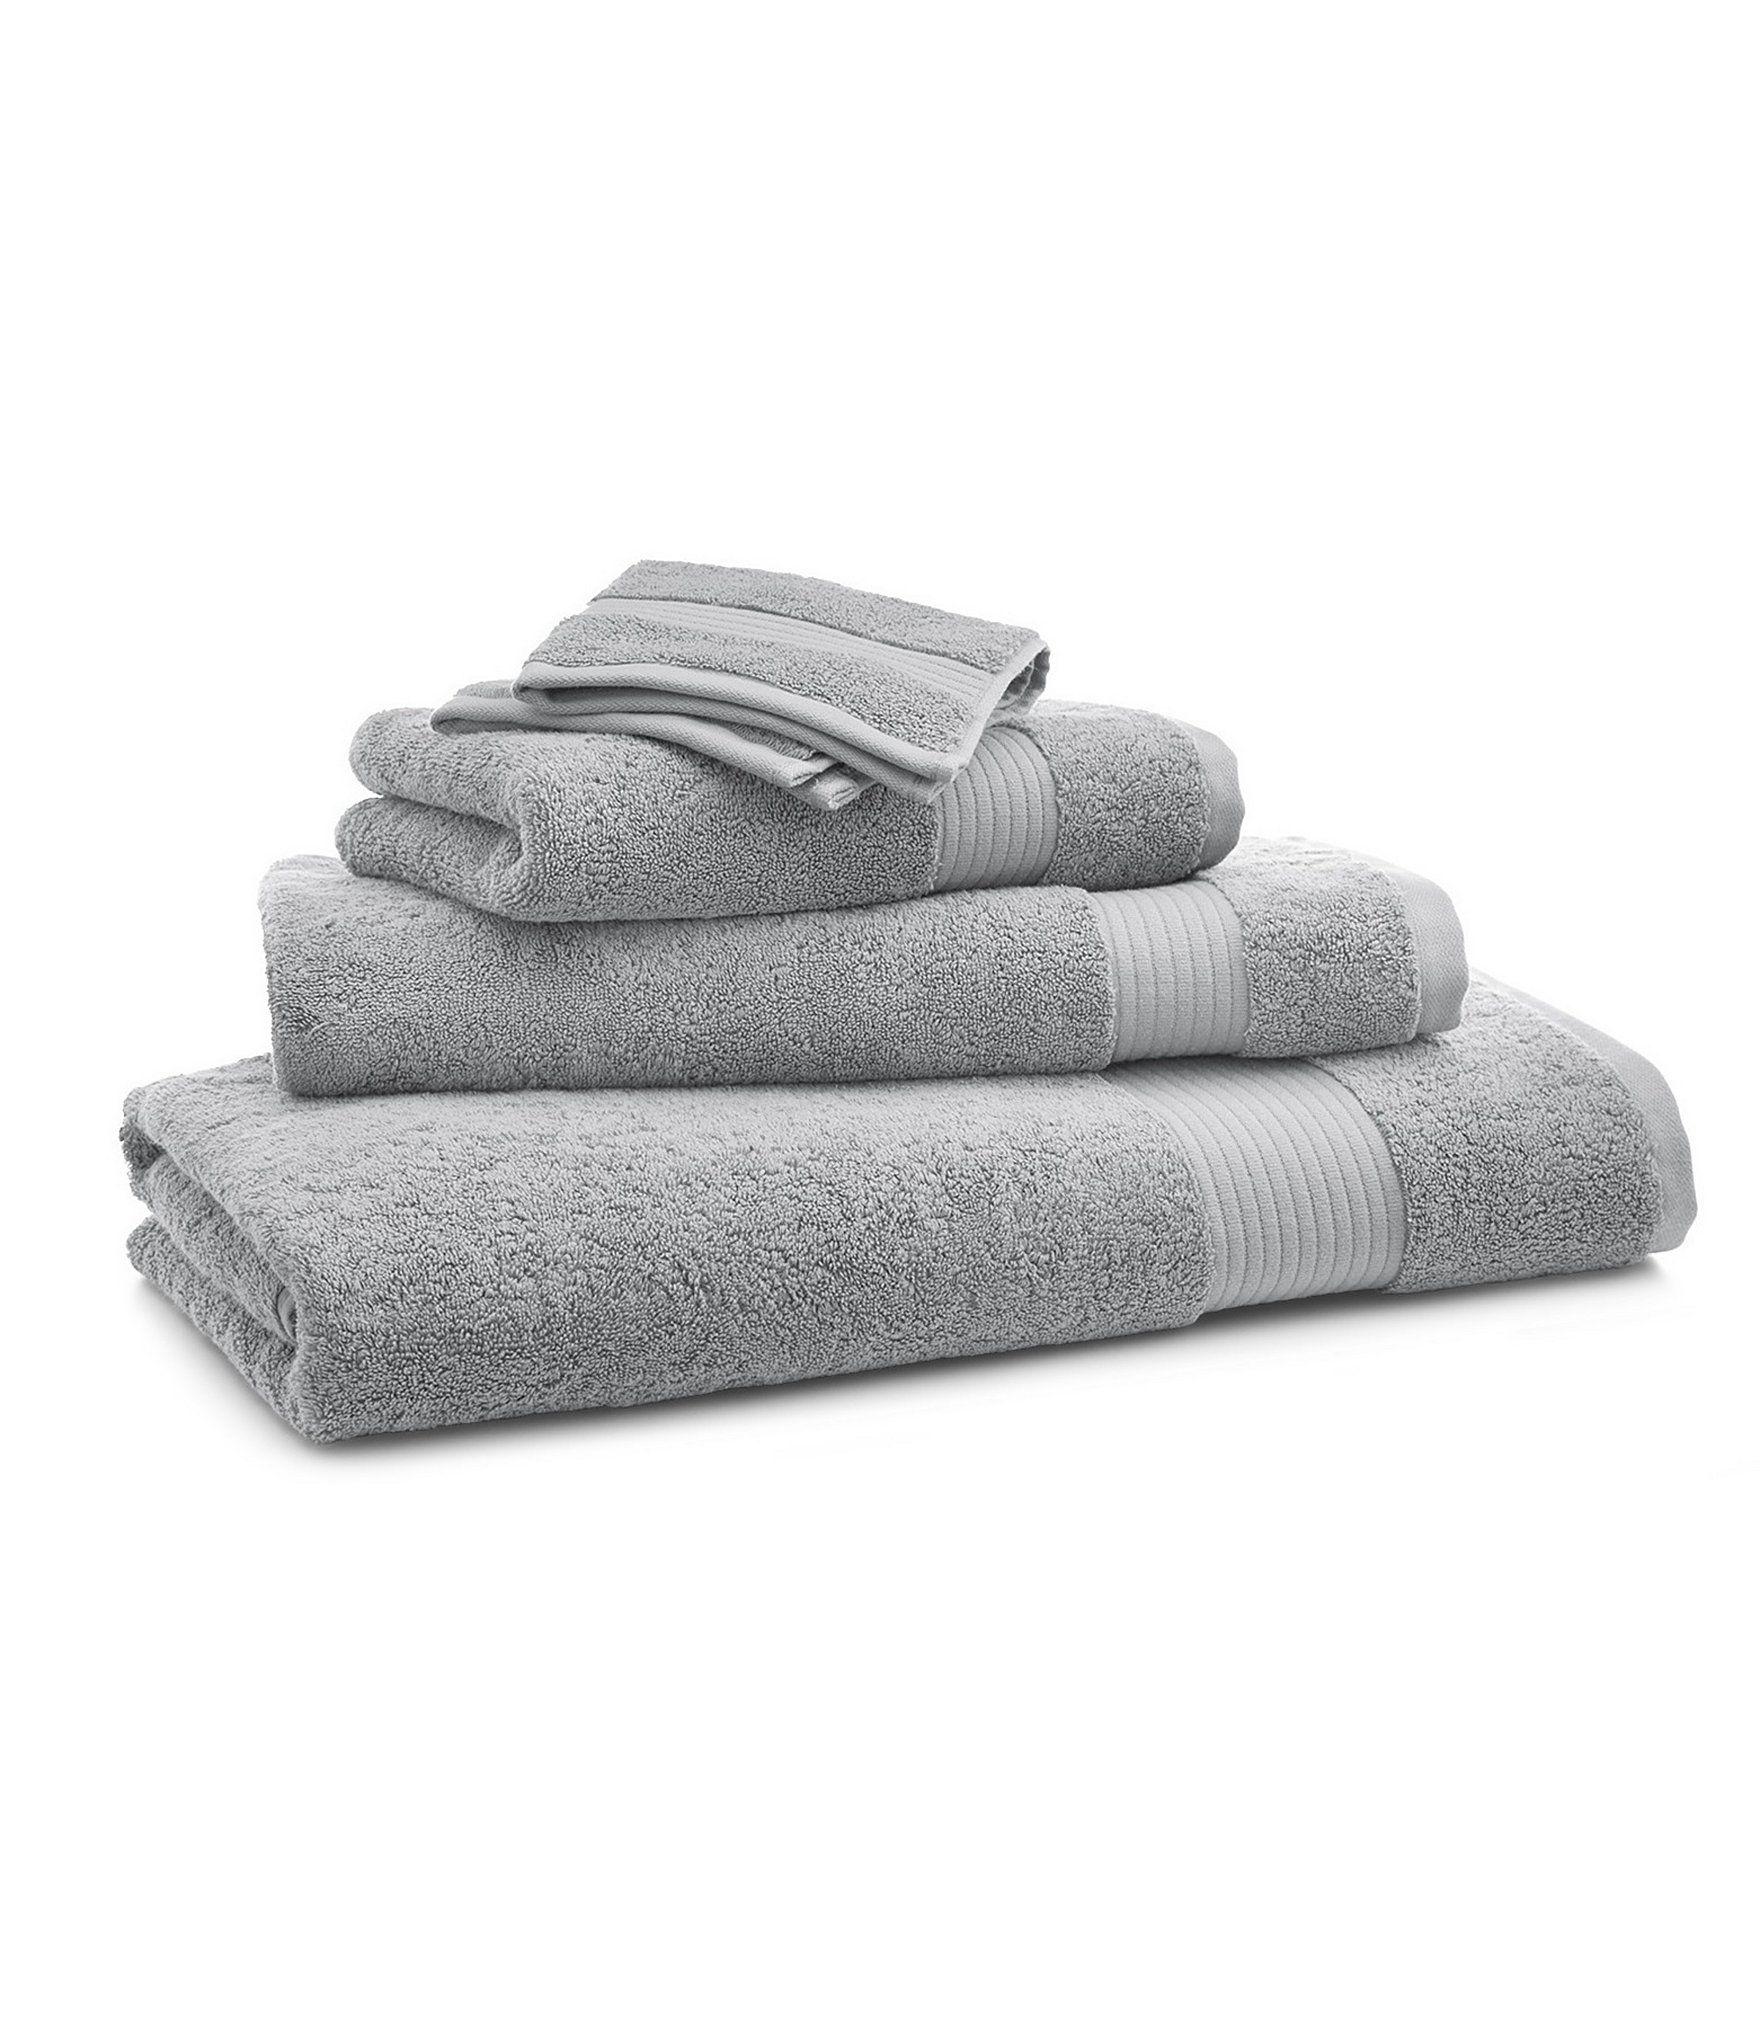 Shop for Ralph Lauren Bowery Bath Towels at Dillards.com. Visit ...